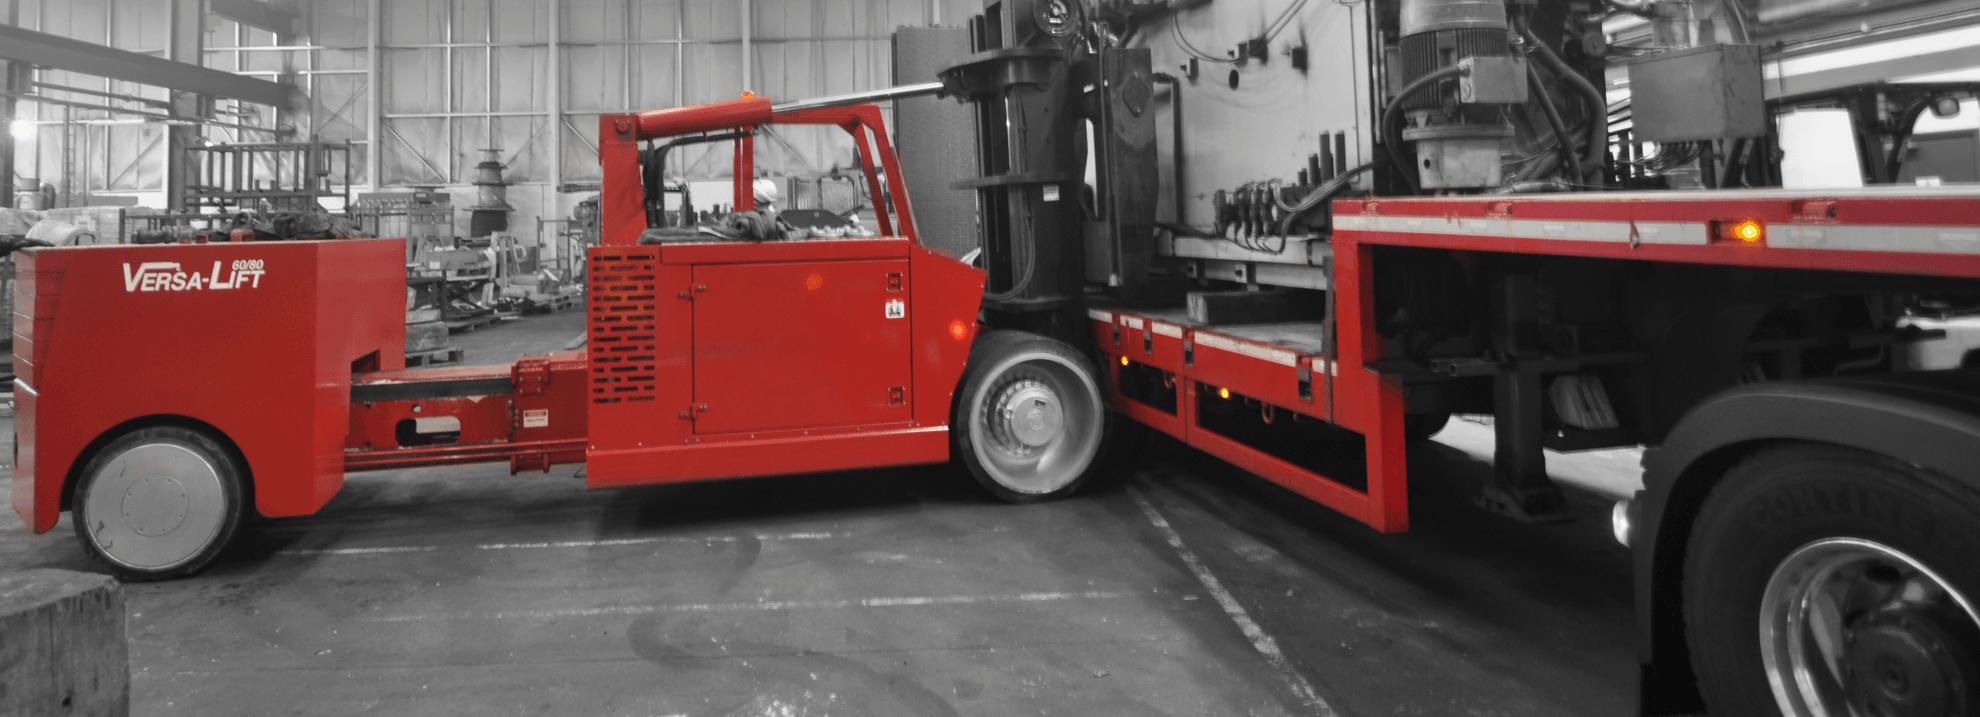 LPG or Battery Powered Versa-Lift Truck